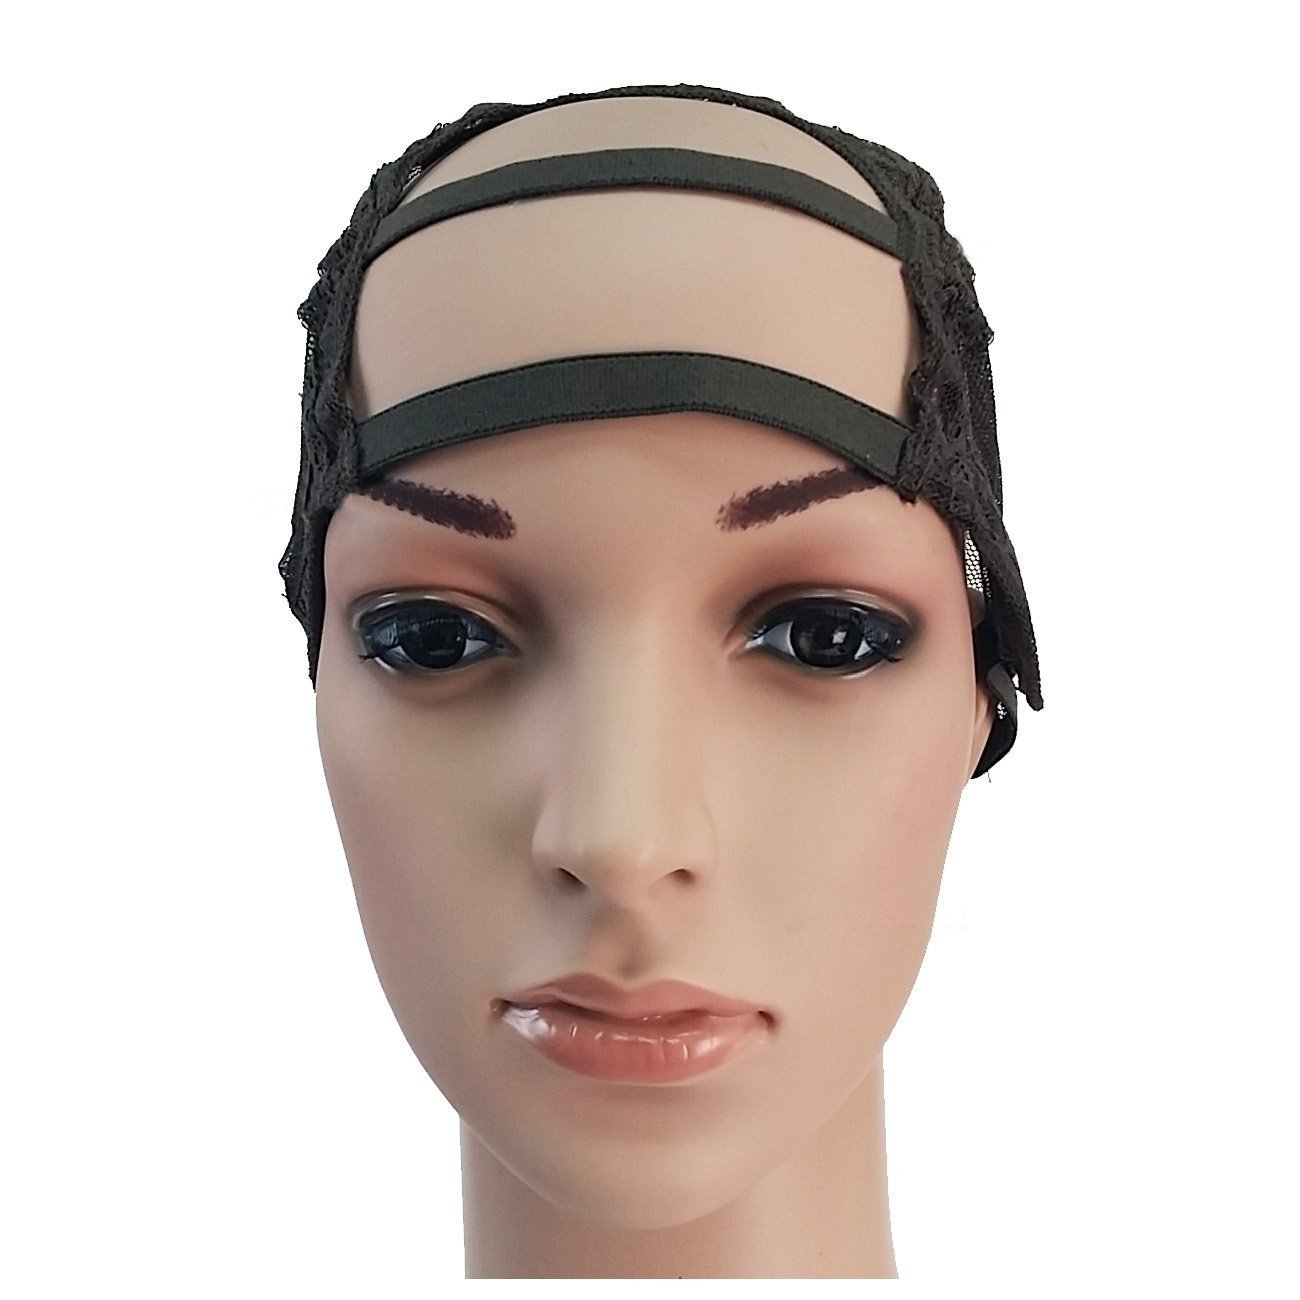 Beauties Factory BF DIY U Part Gap Wide Front Middle Weaving Wig Cap Net Mesh Adjustable Strap CODE: 1238F